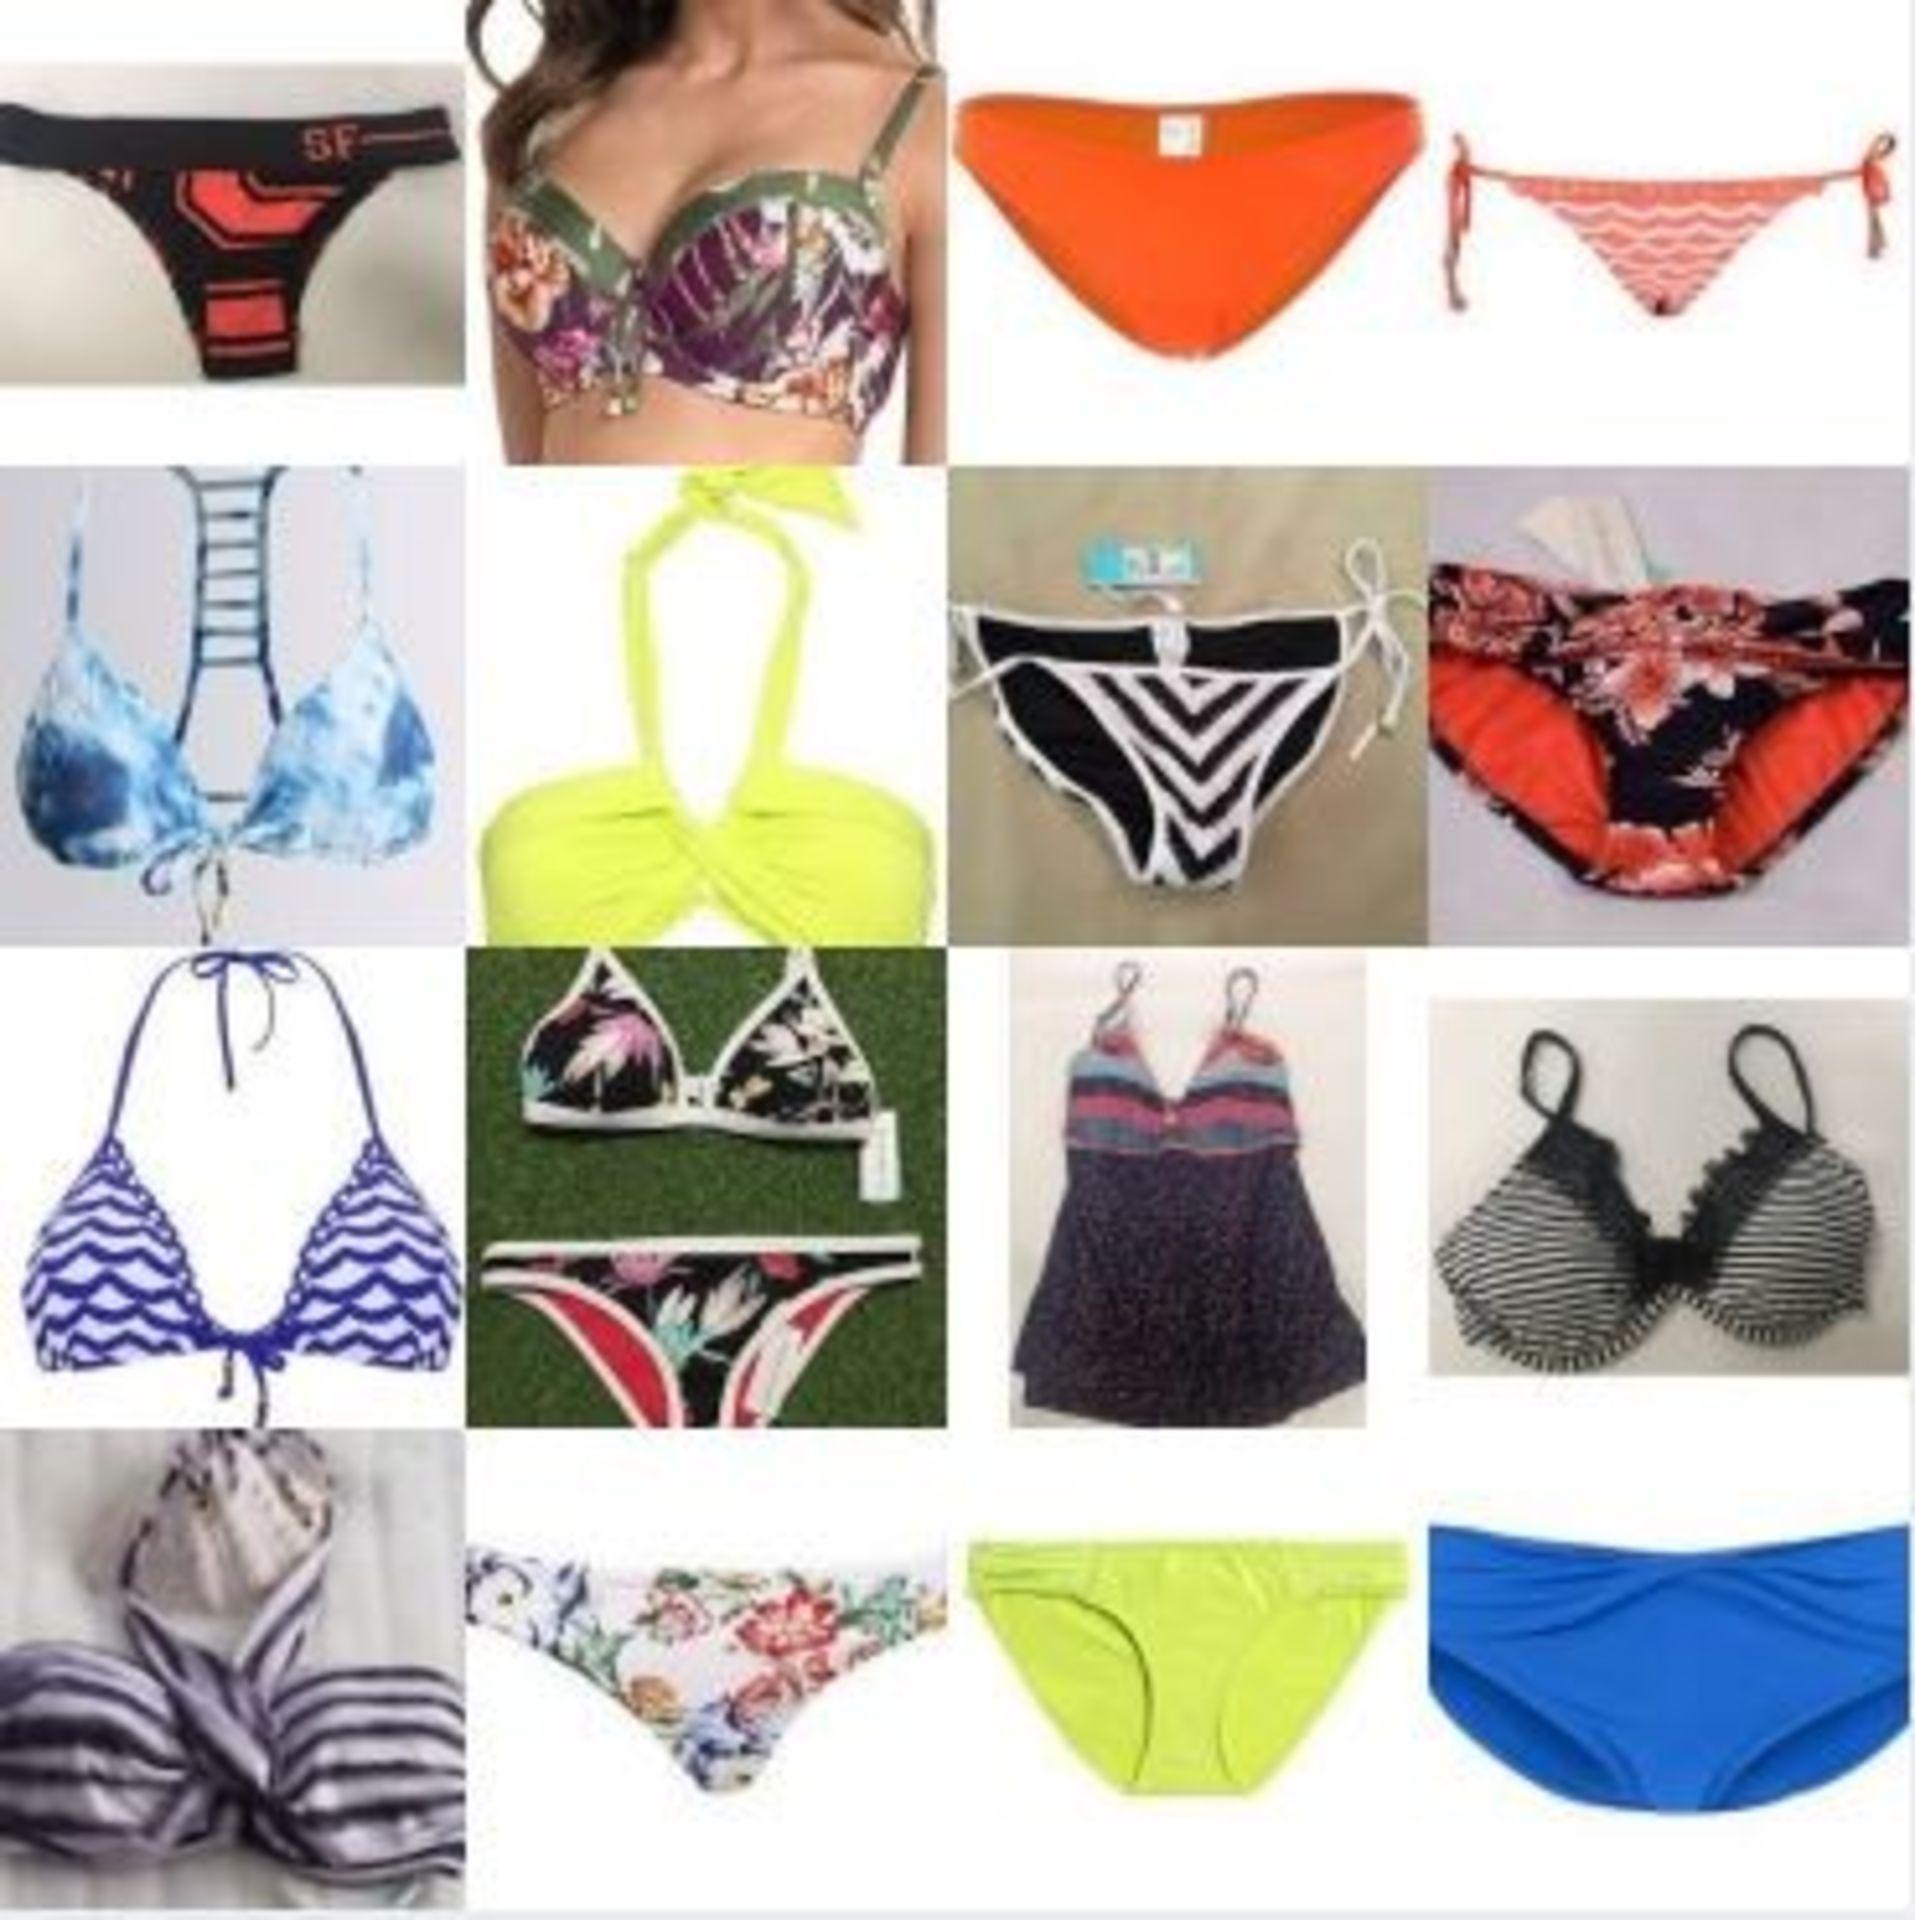 Lot 20 - Sourced From Big Brand Bikini Manufacturer SeaFolly: